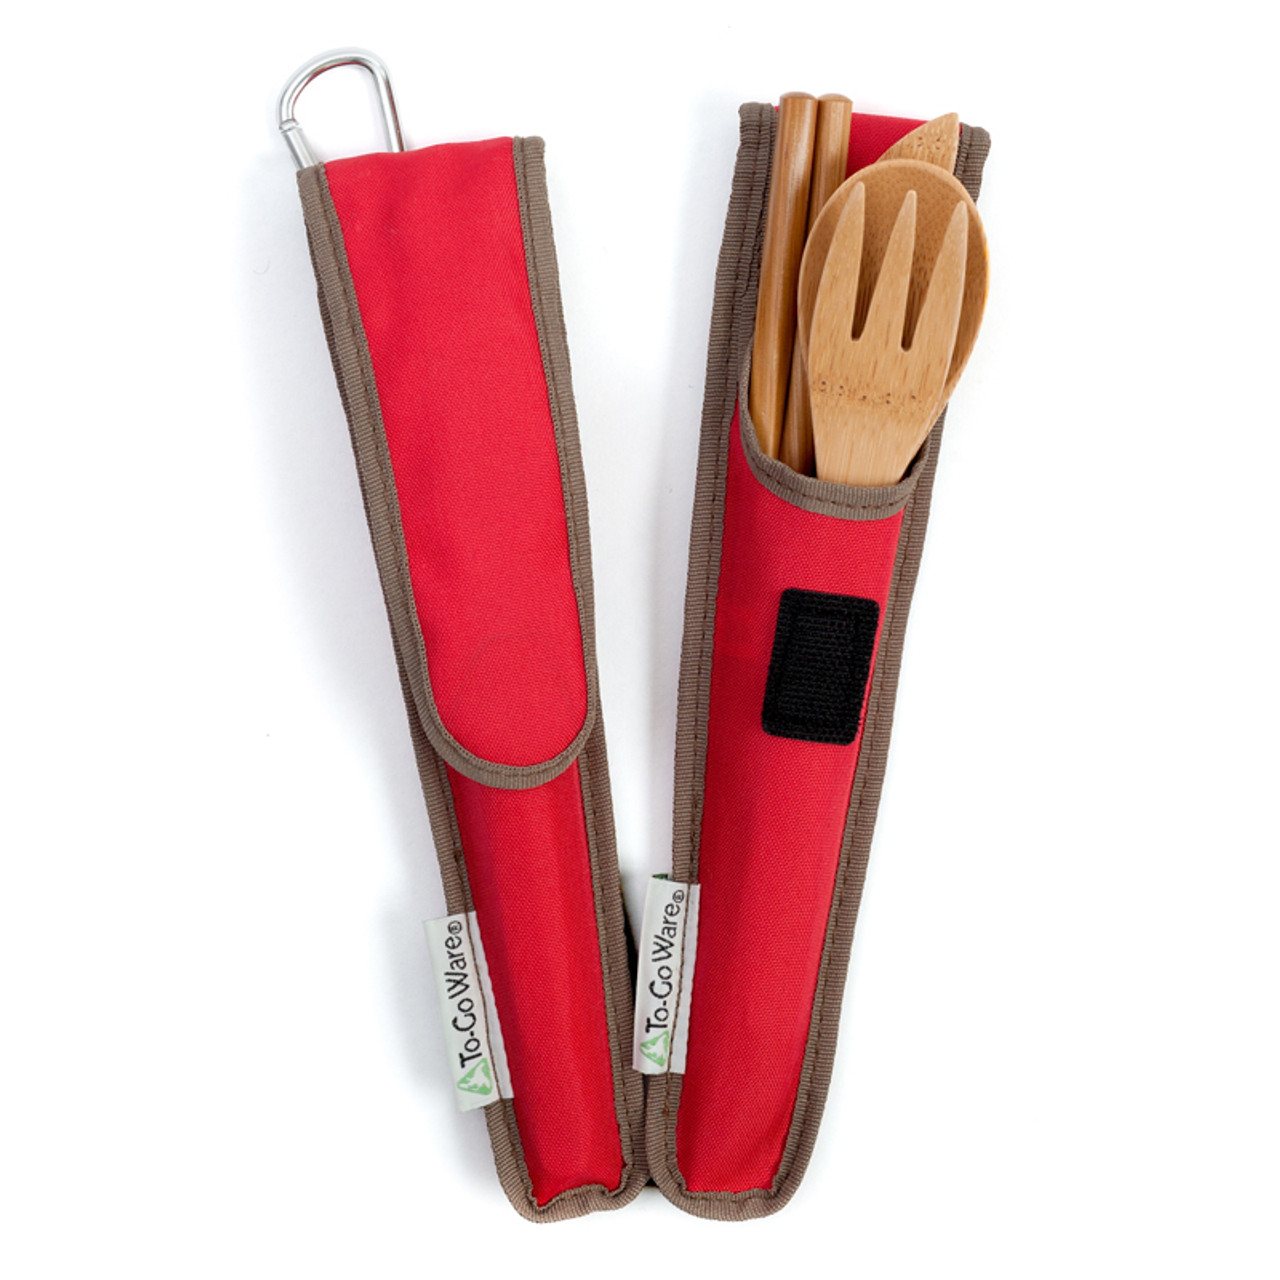 To Go Ware RePEaT Bamboo Utensil Set